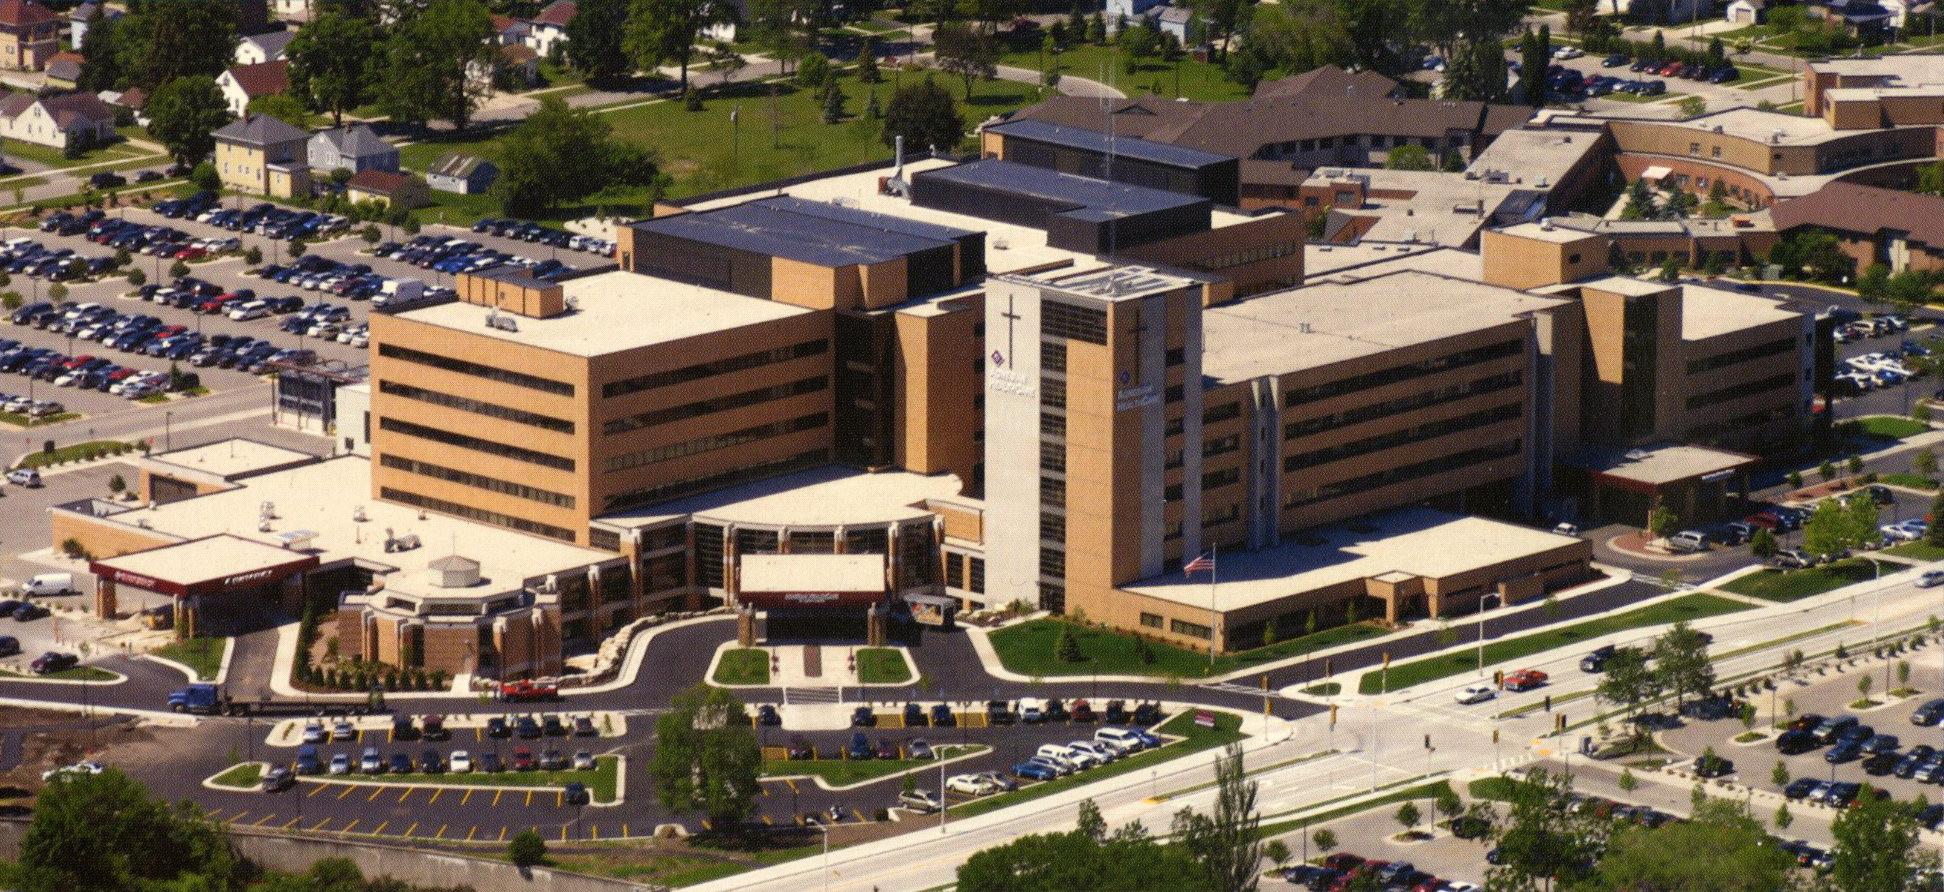 St. Agnes Hospital, c. 2006.